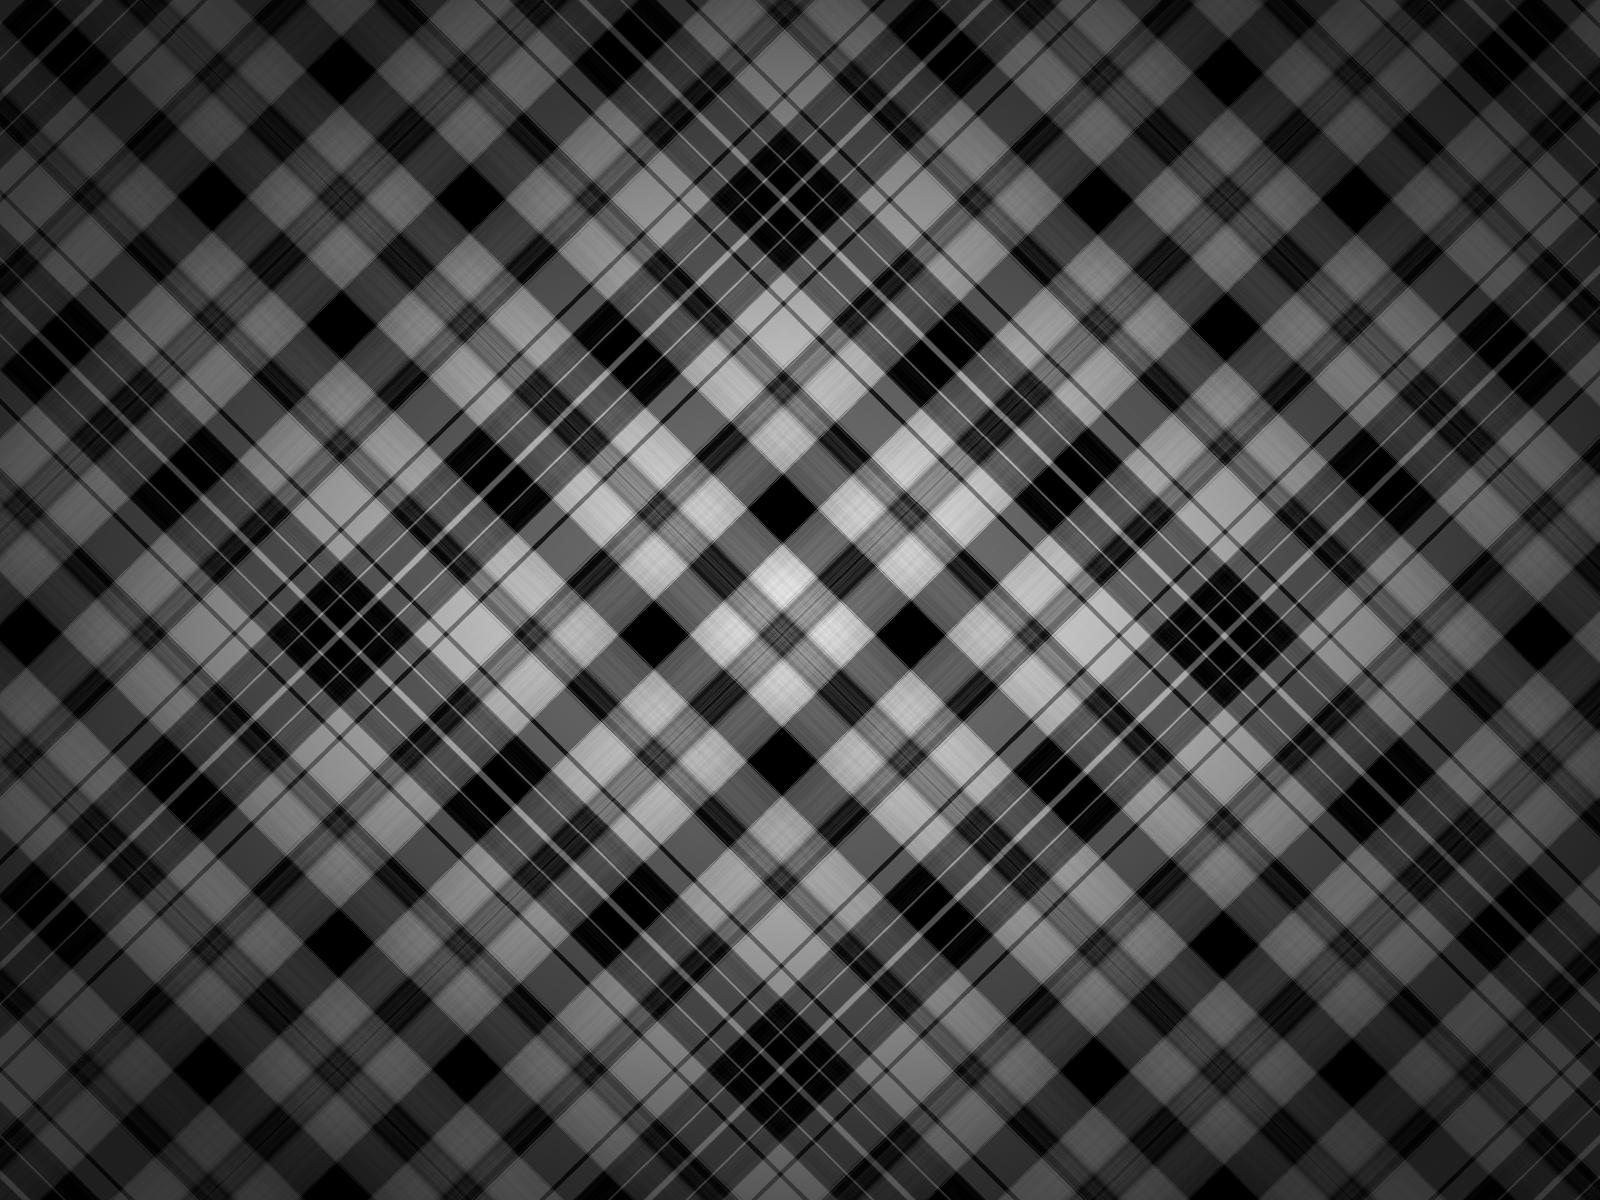 Dark Pattern HD Images Wallpaper - HD Wallpapers | Patterns in 2019 | Pattern wallpaper, Hd ...